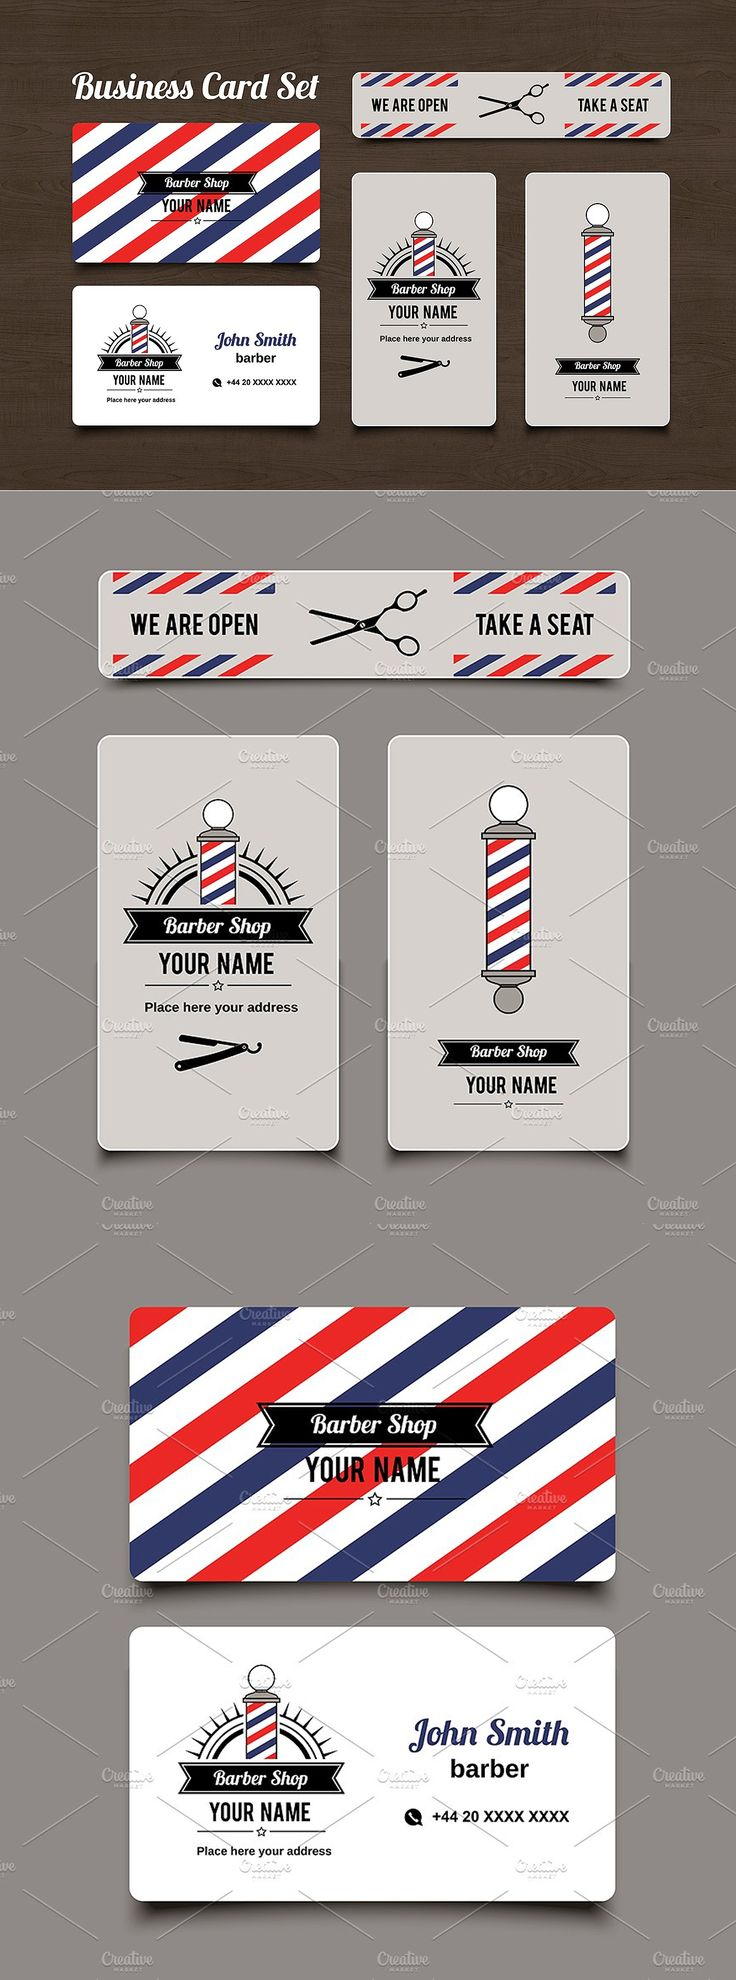 Barbershop Business Card Template | Barbershop, Card templates and ...